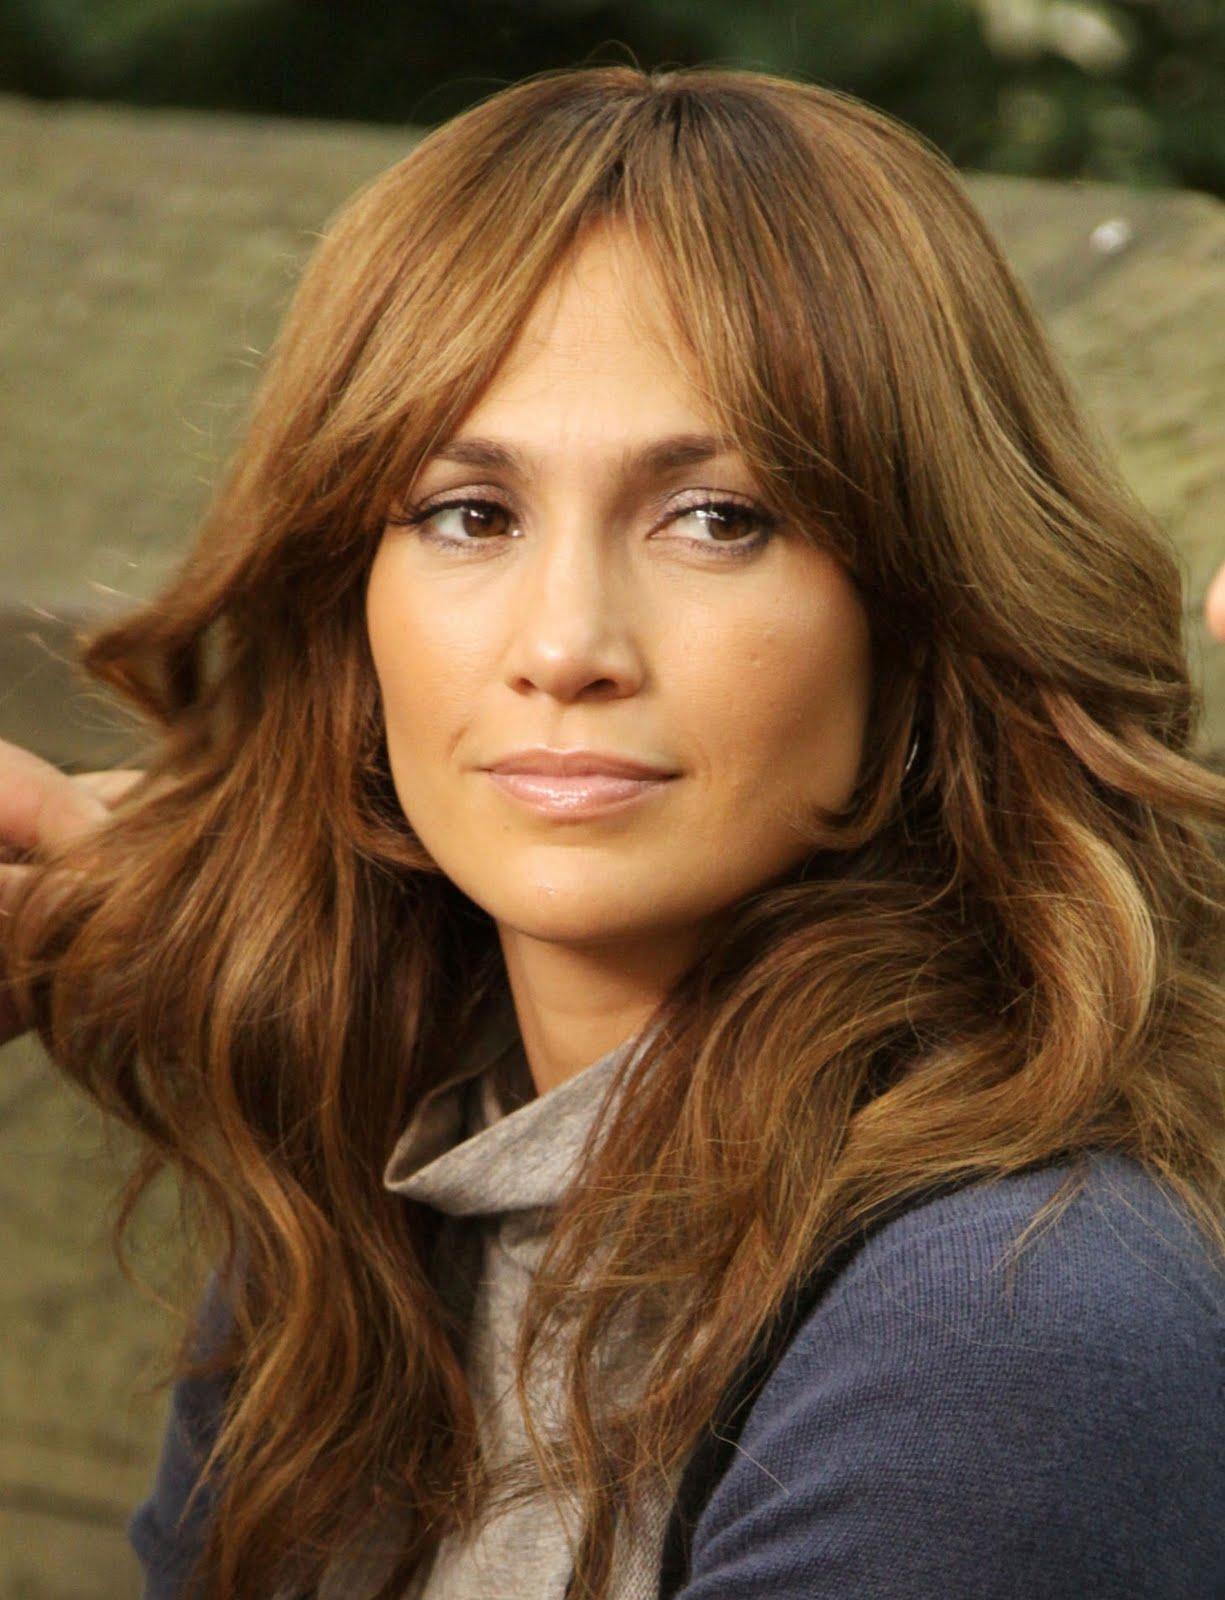 http://1.bp.blogspot.com/-AngSiAkBa2U/Tl_5U6arEsI/AAAAAAAAA24/6HKcvuExrWE/s1600/Jennifer+Lopez++16.jpg